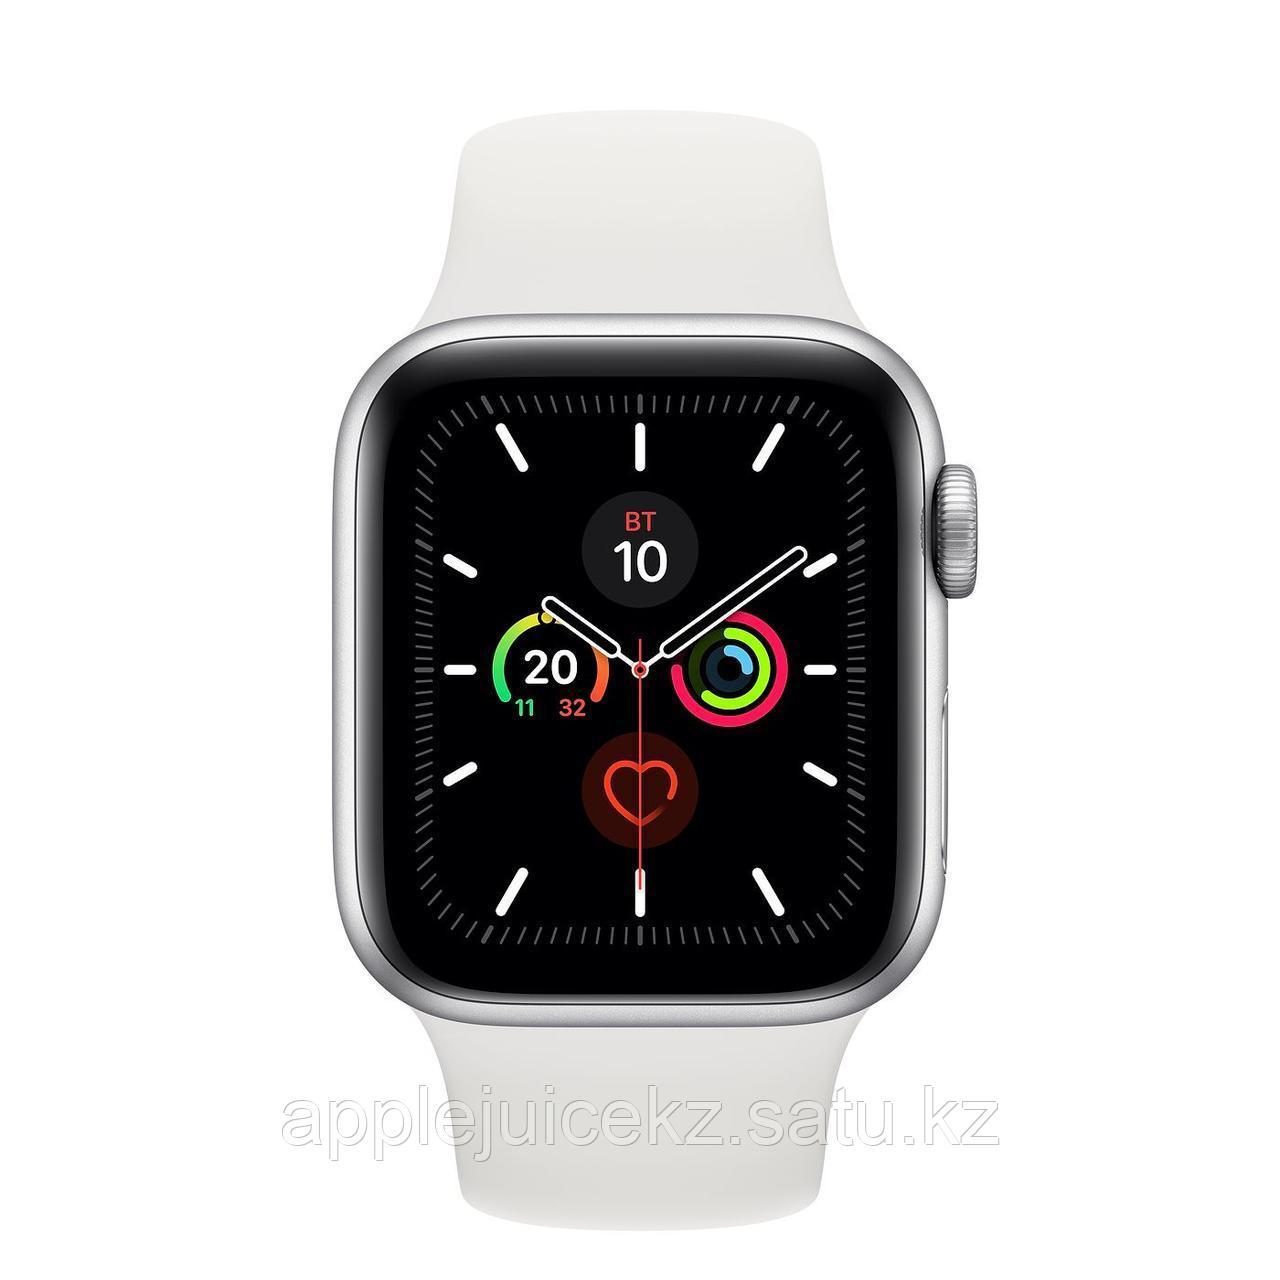 Apple Watch Series 5, GPS, корпус 44 мм, алюминий серебристого цвета, спортивный ремешок белого цвета,